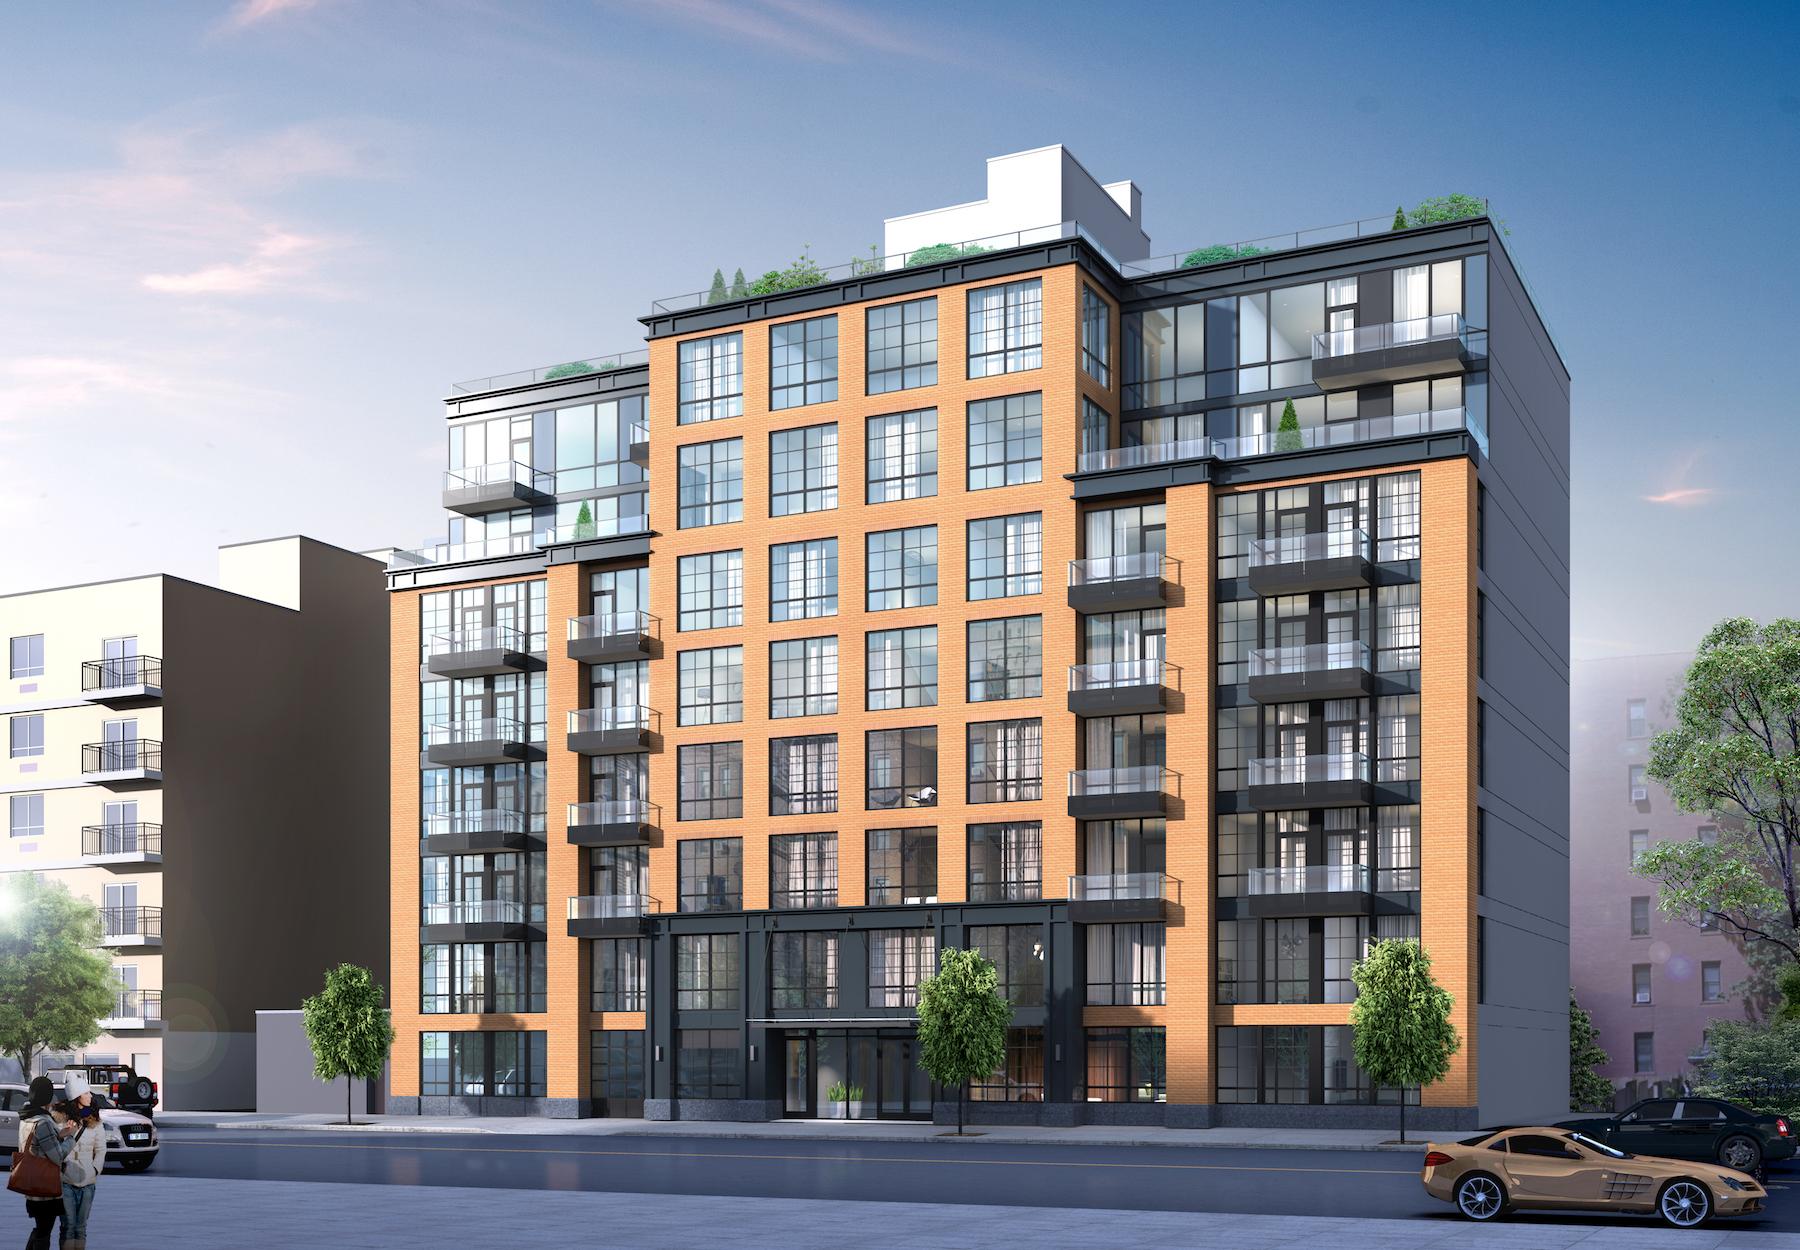 Buy Multifamily Building In New York